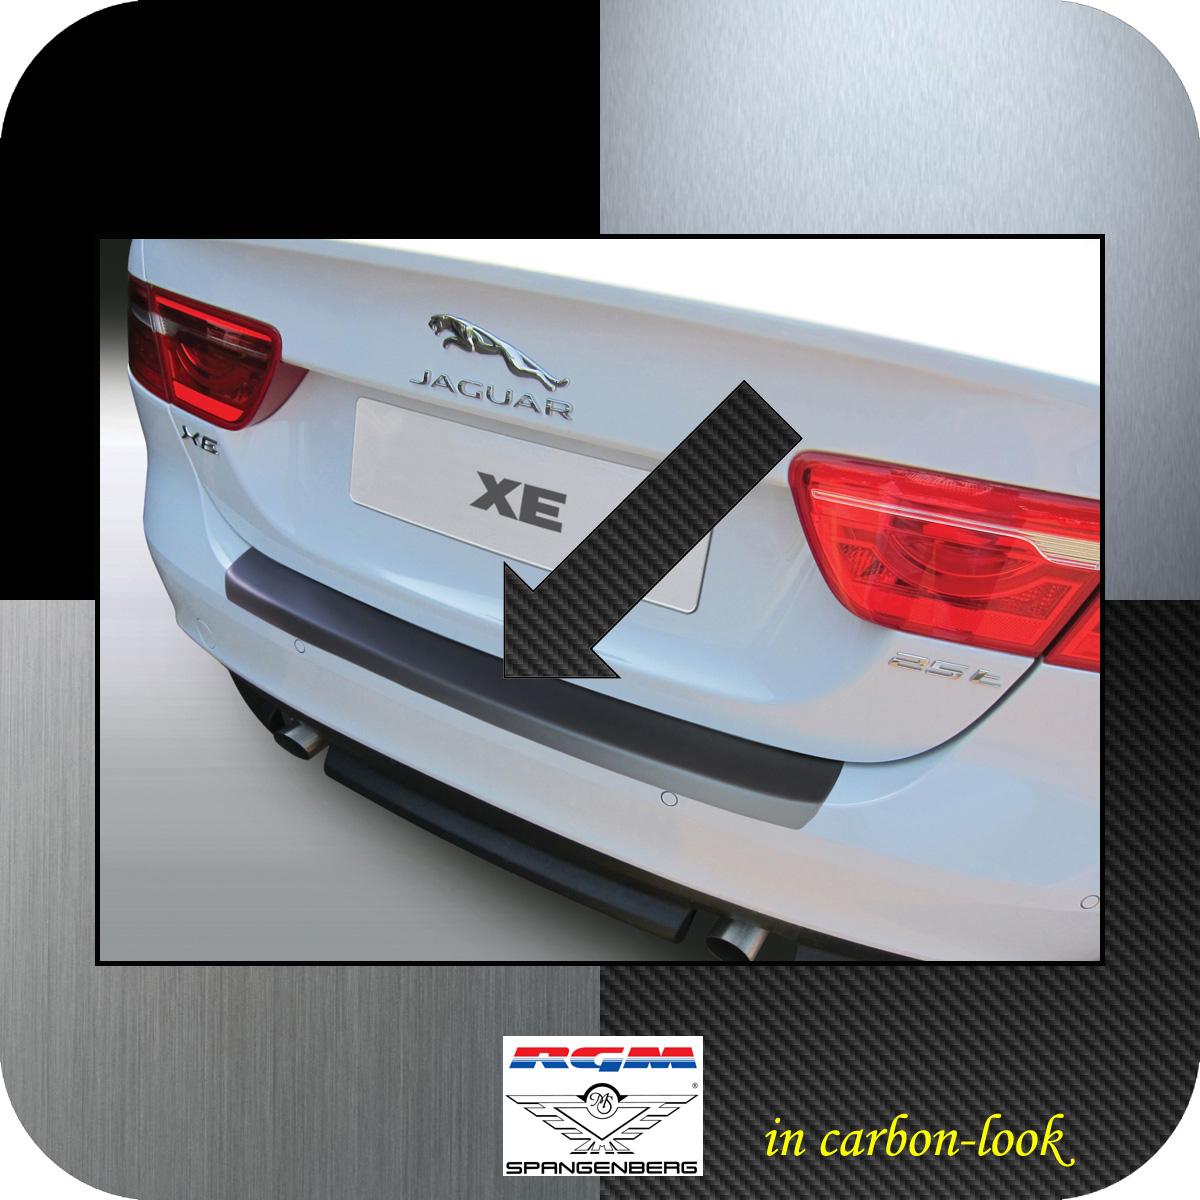 Ladekantenschutz Carbon-Look Jaguar XE Limousine 4-Türer X760 ab 2015- 3509891